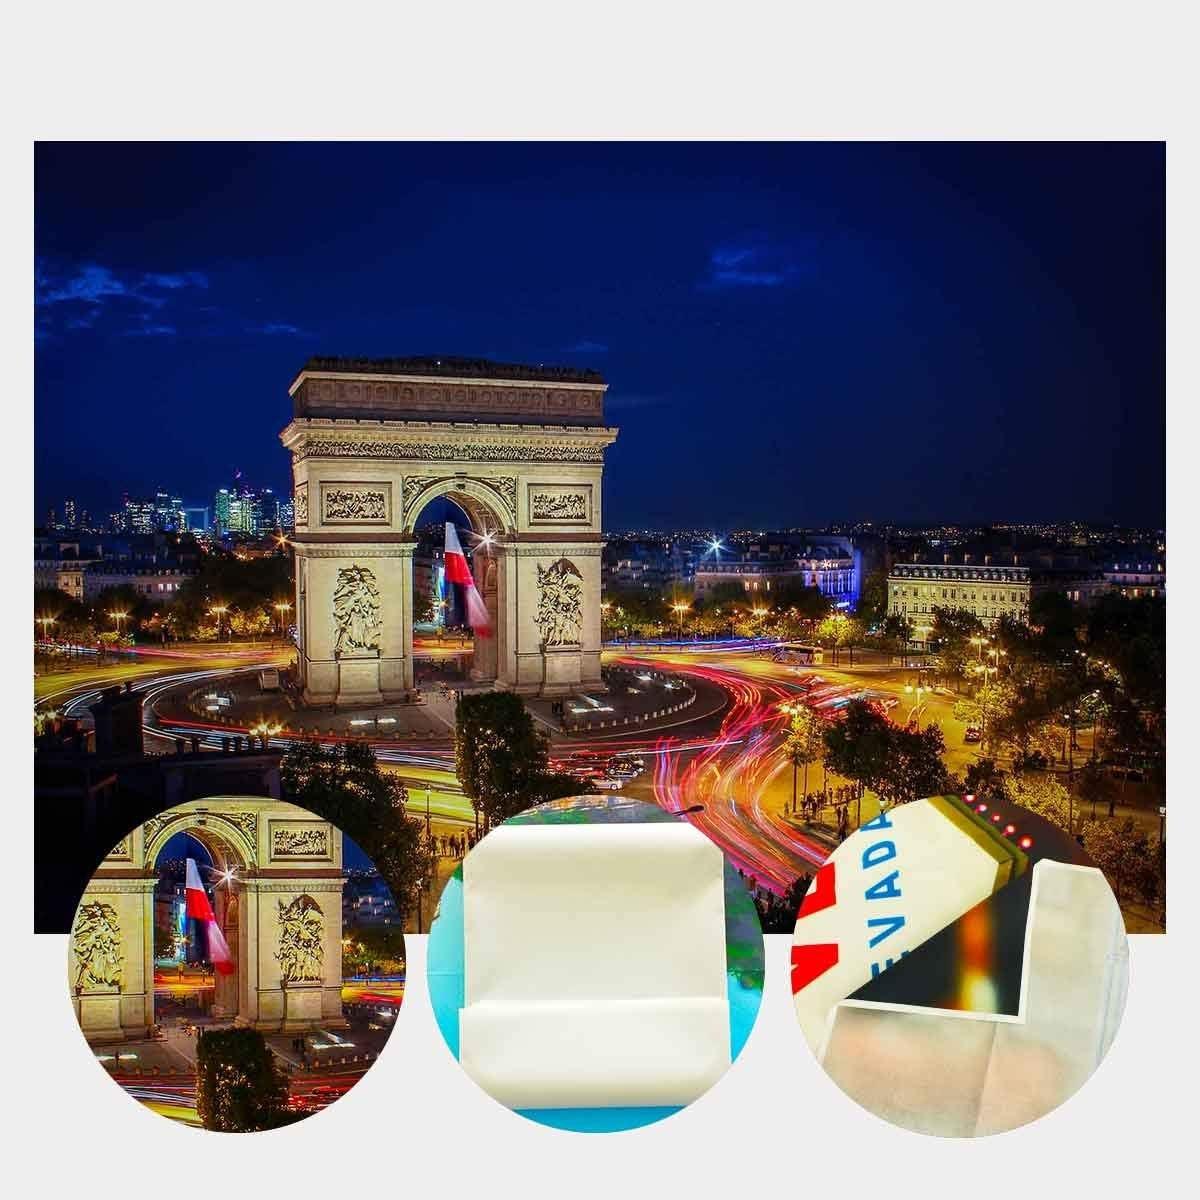 GoEoo 7X5ft Arc de Triomphe Backdrop Romantic Paris Arc de Triomphe Night Photography Backdrop Photo Art Studio Background Props LYGY196